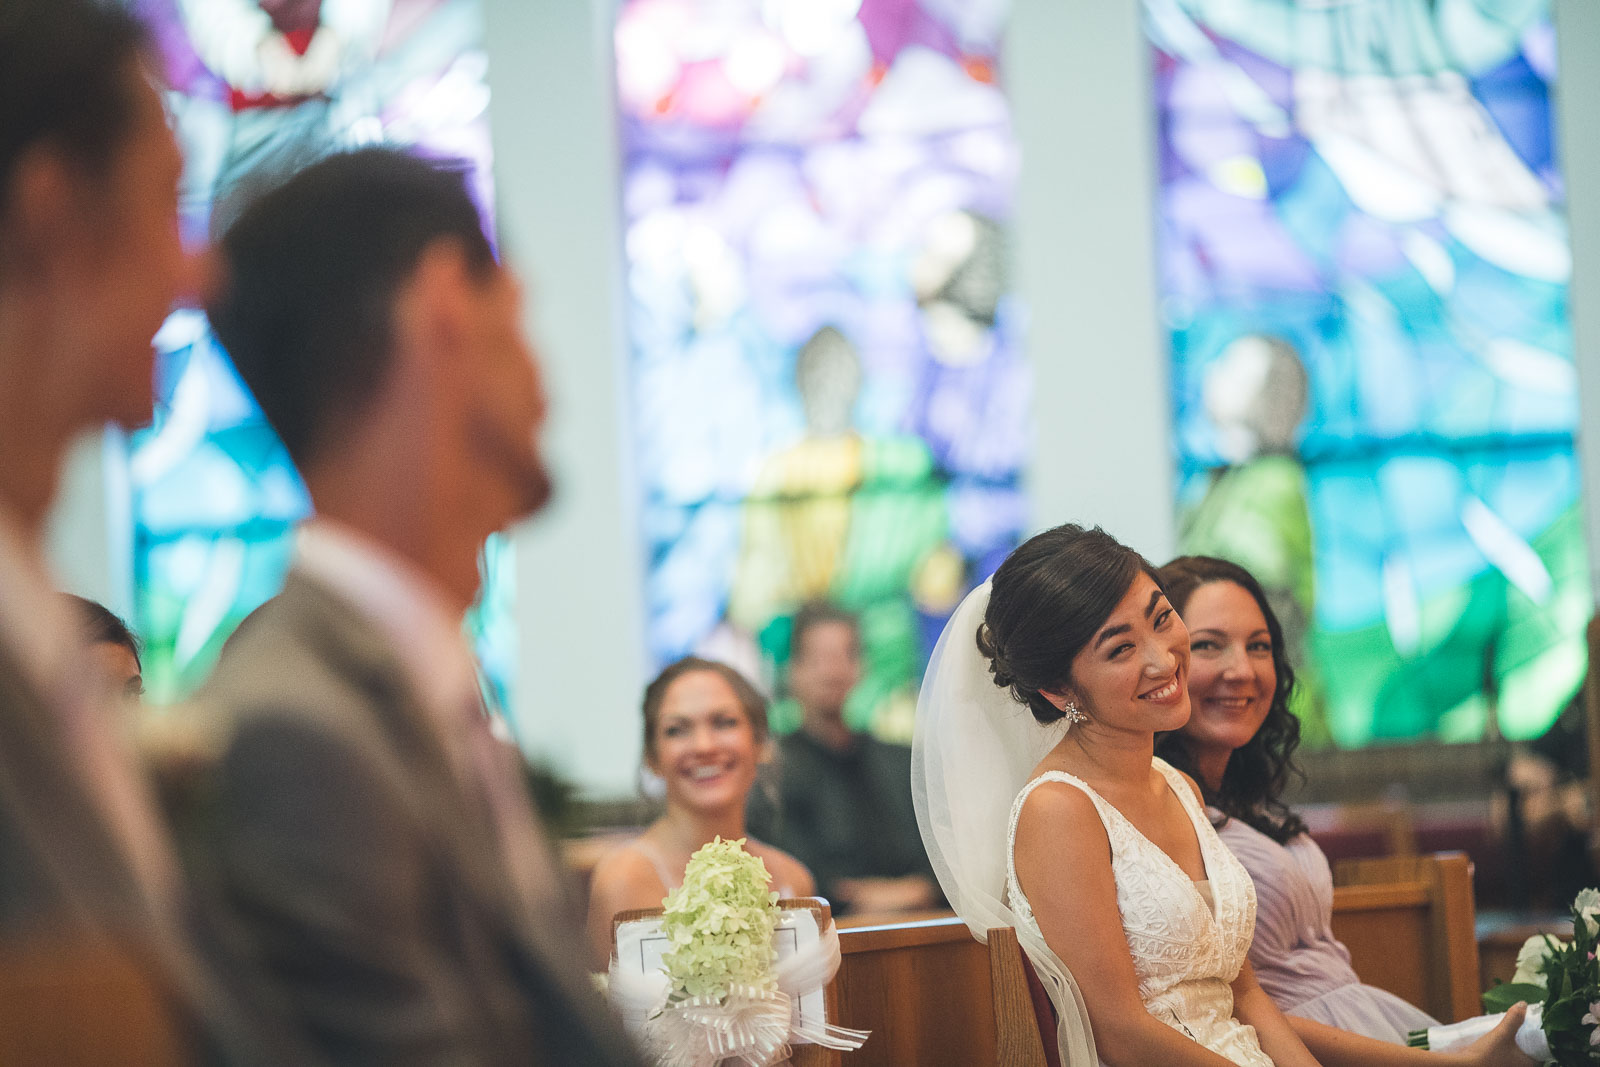 Bride gives groom a look